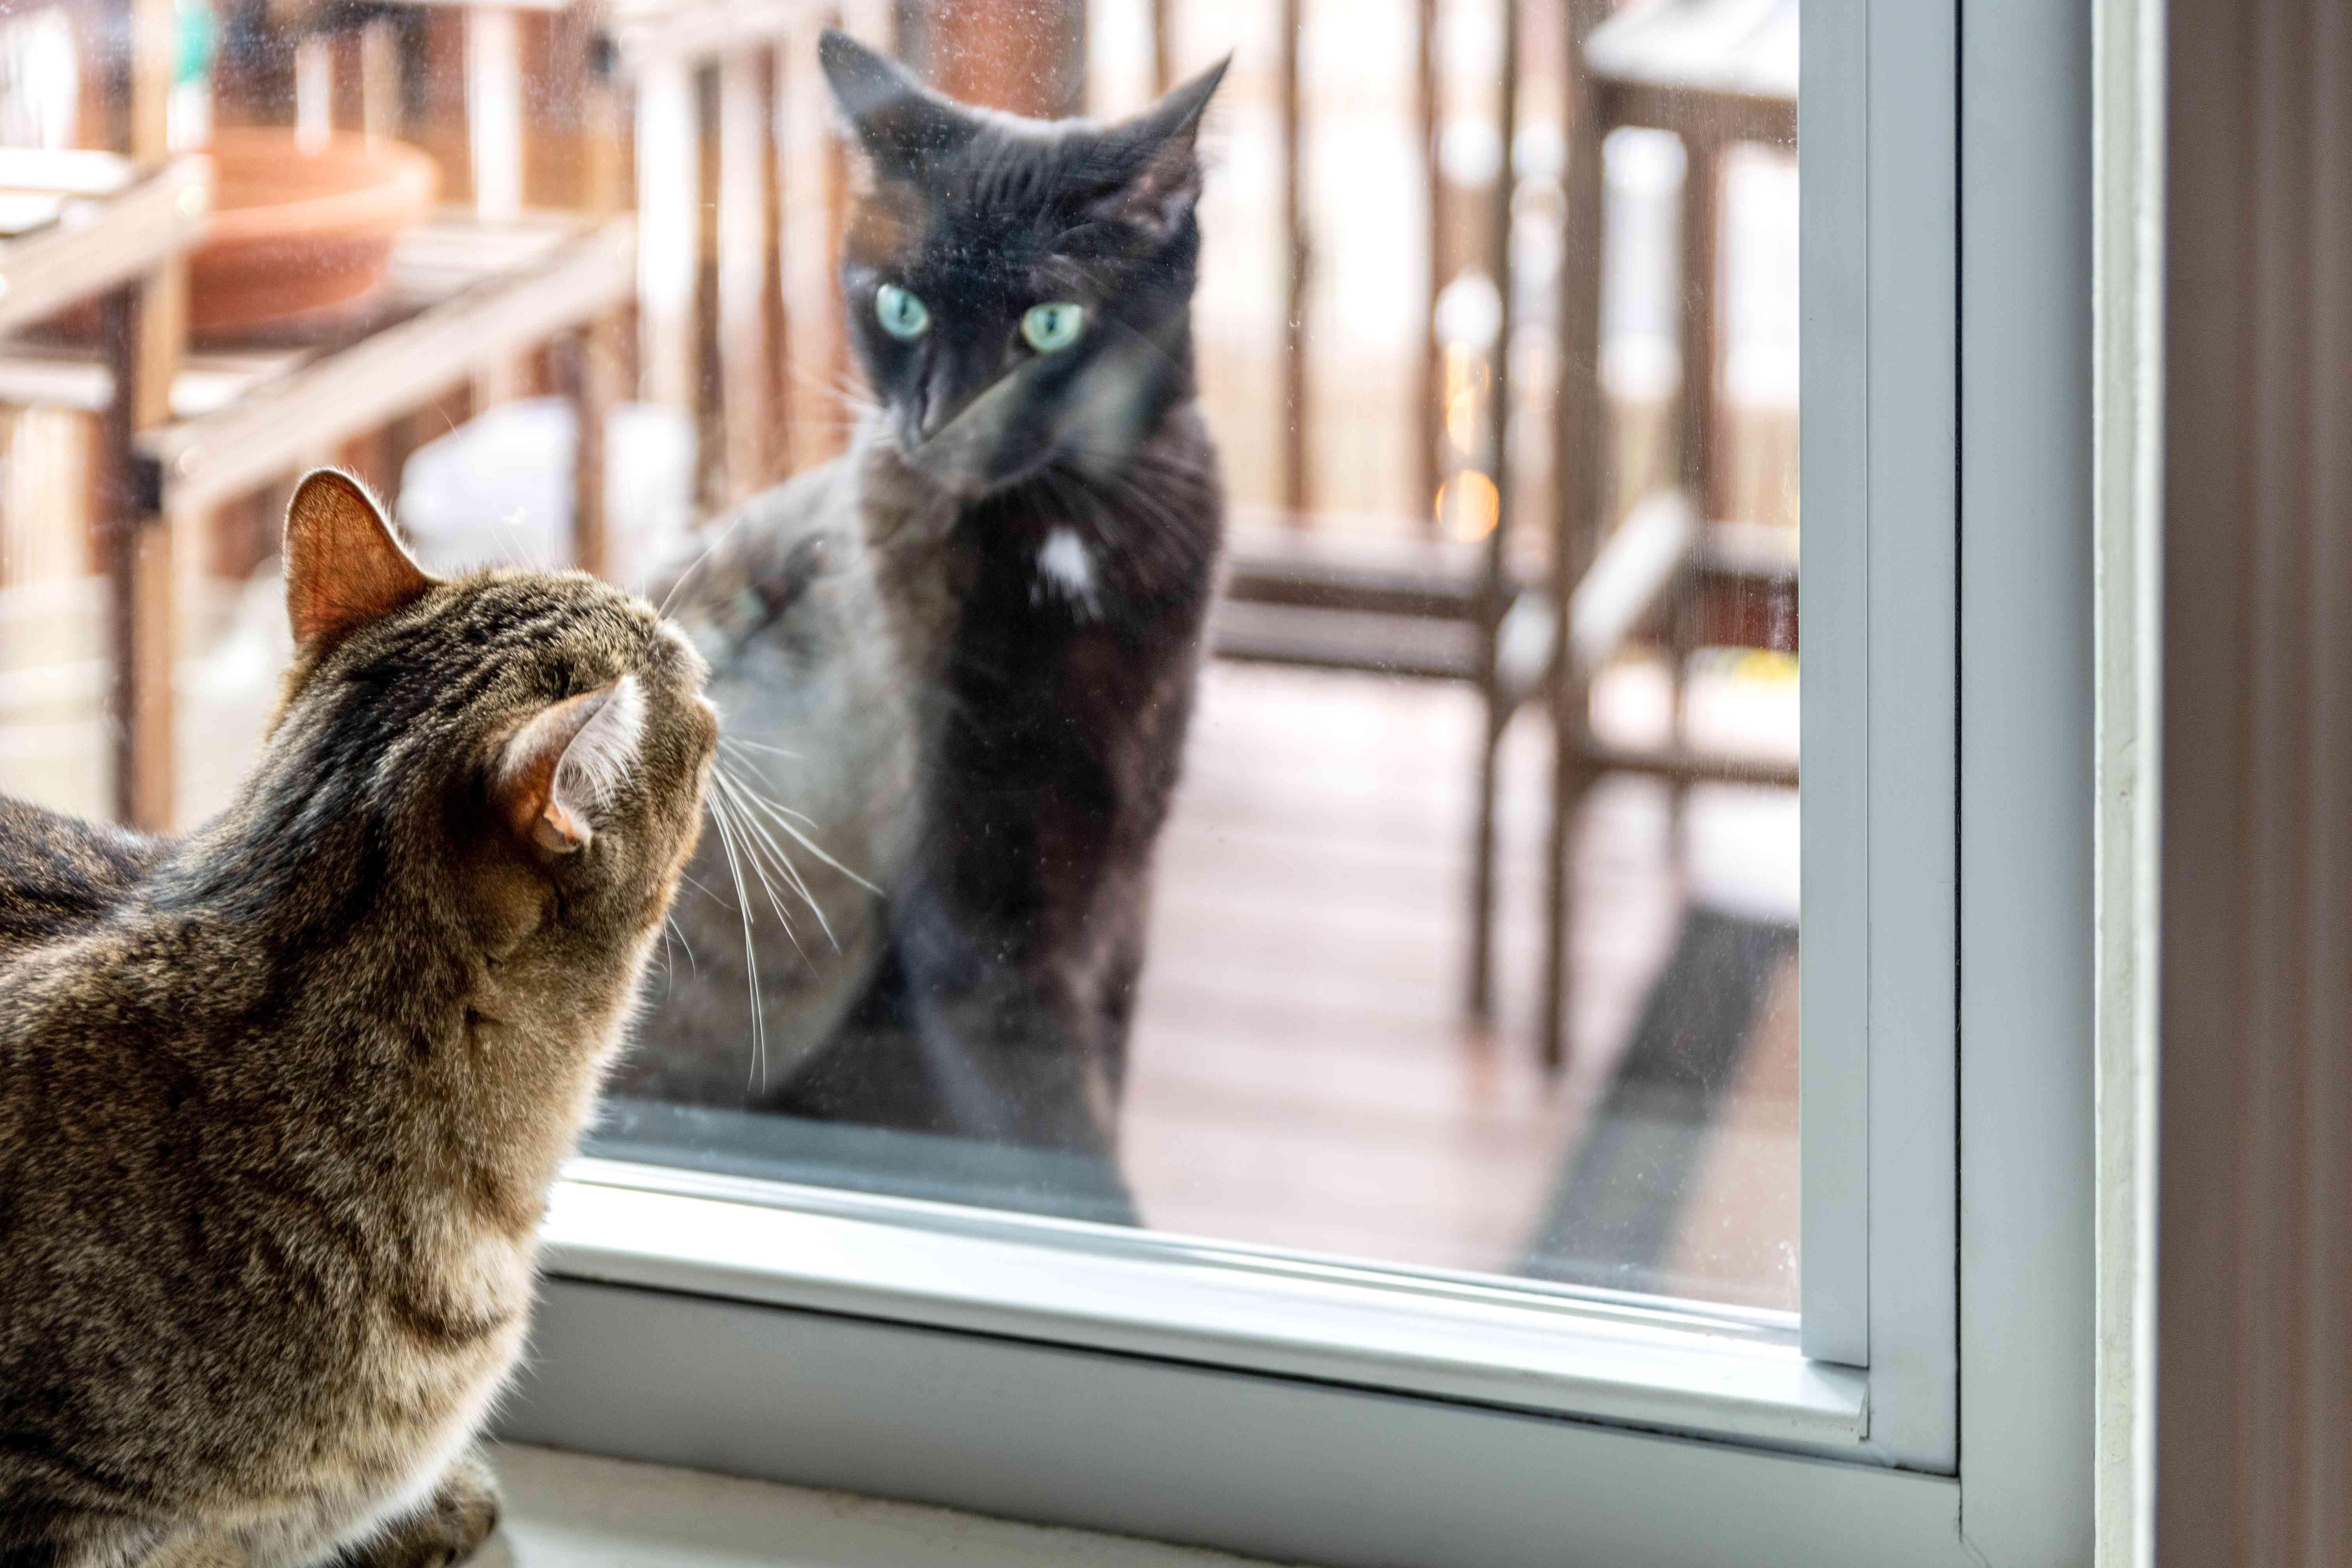 Strange cat outside glass sliding door in front of brown cat